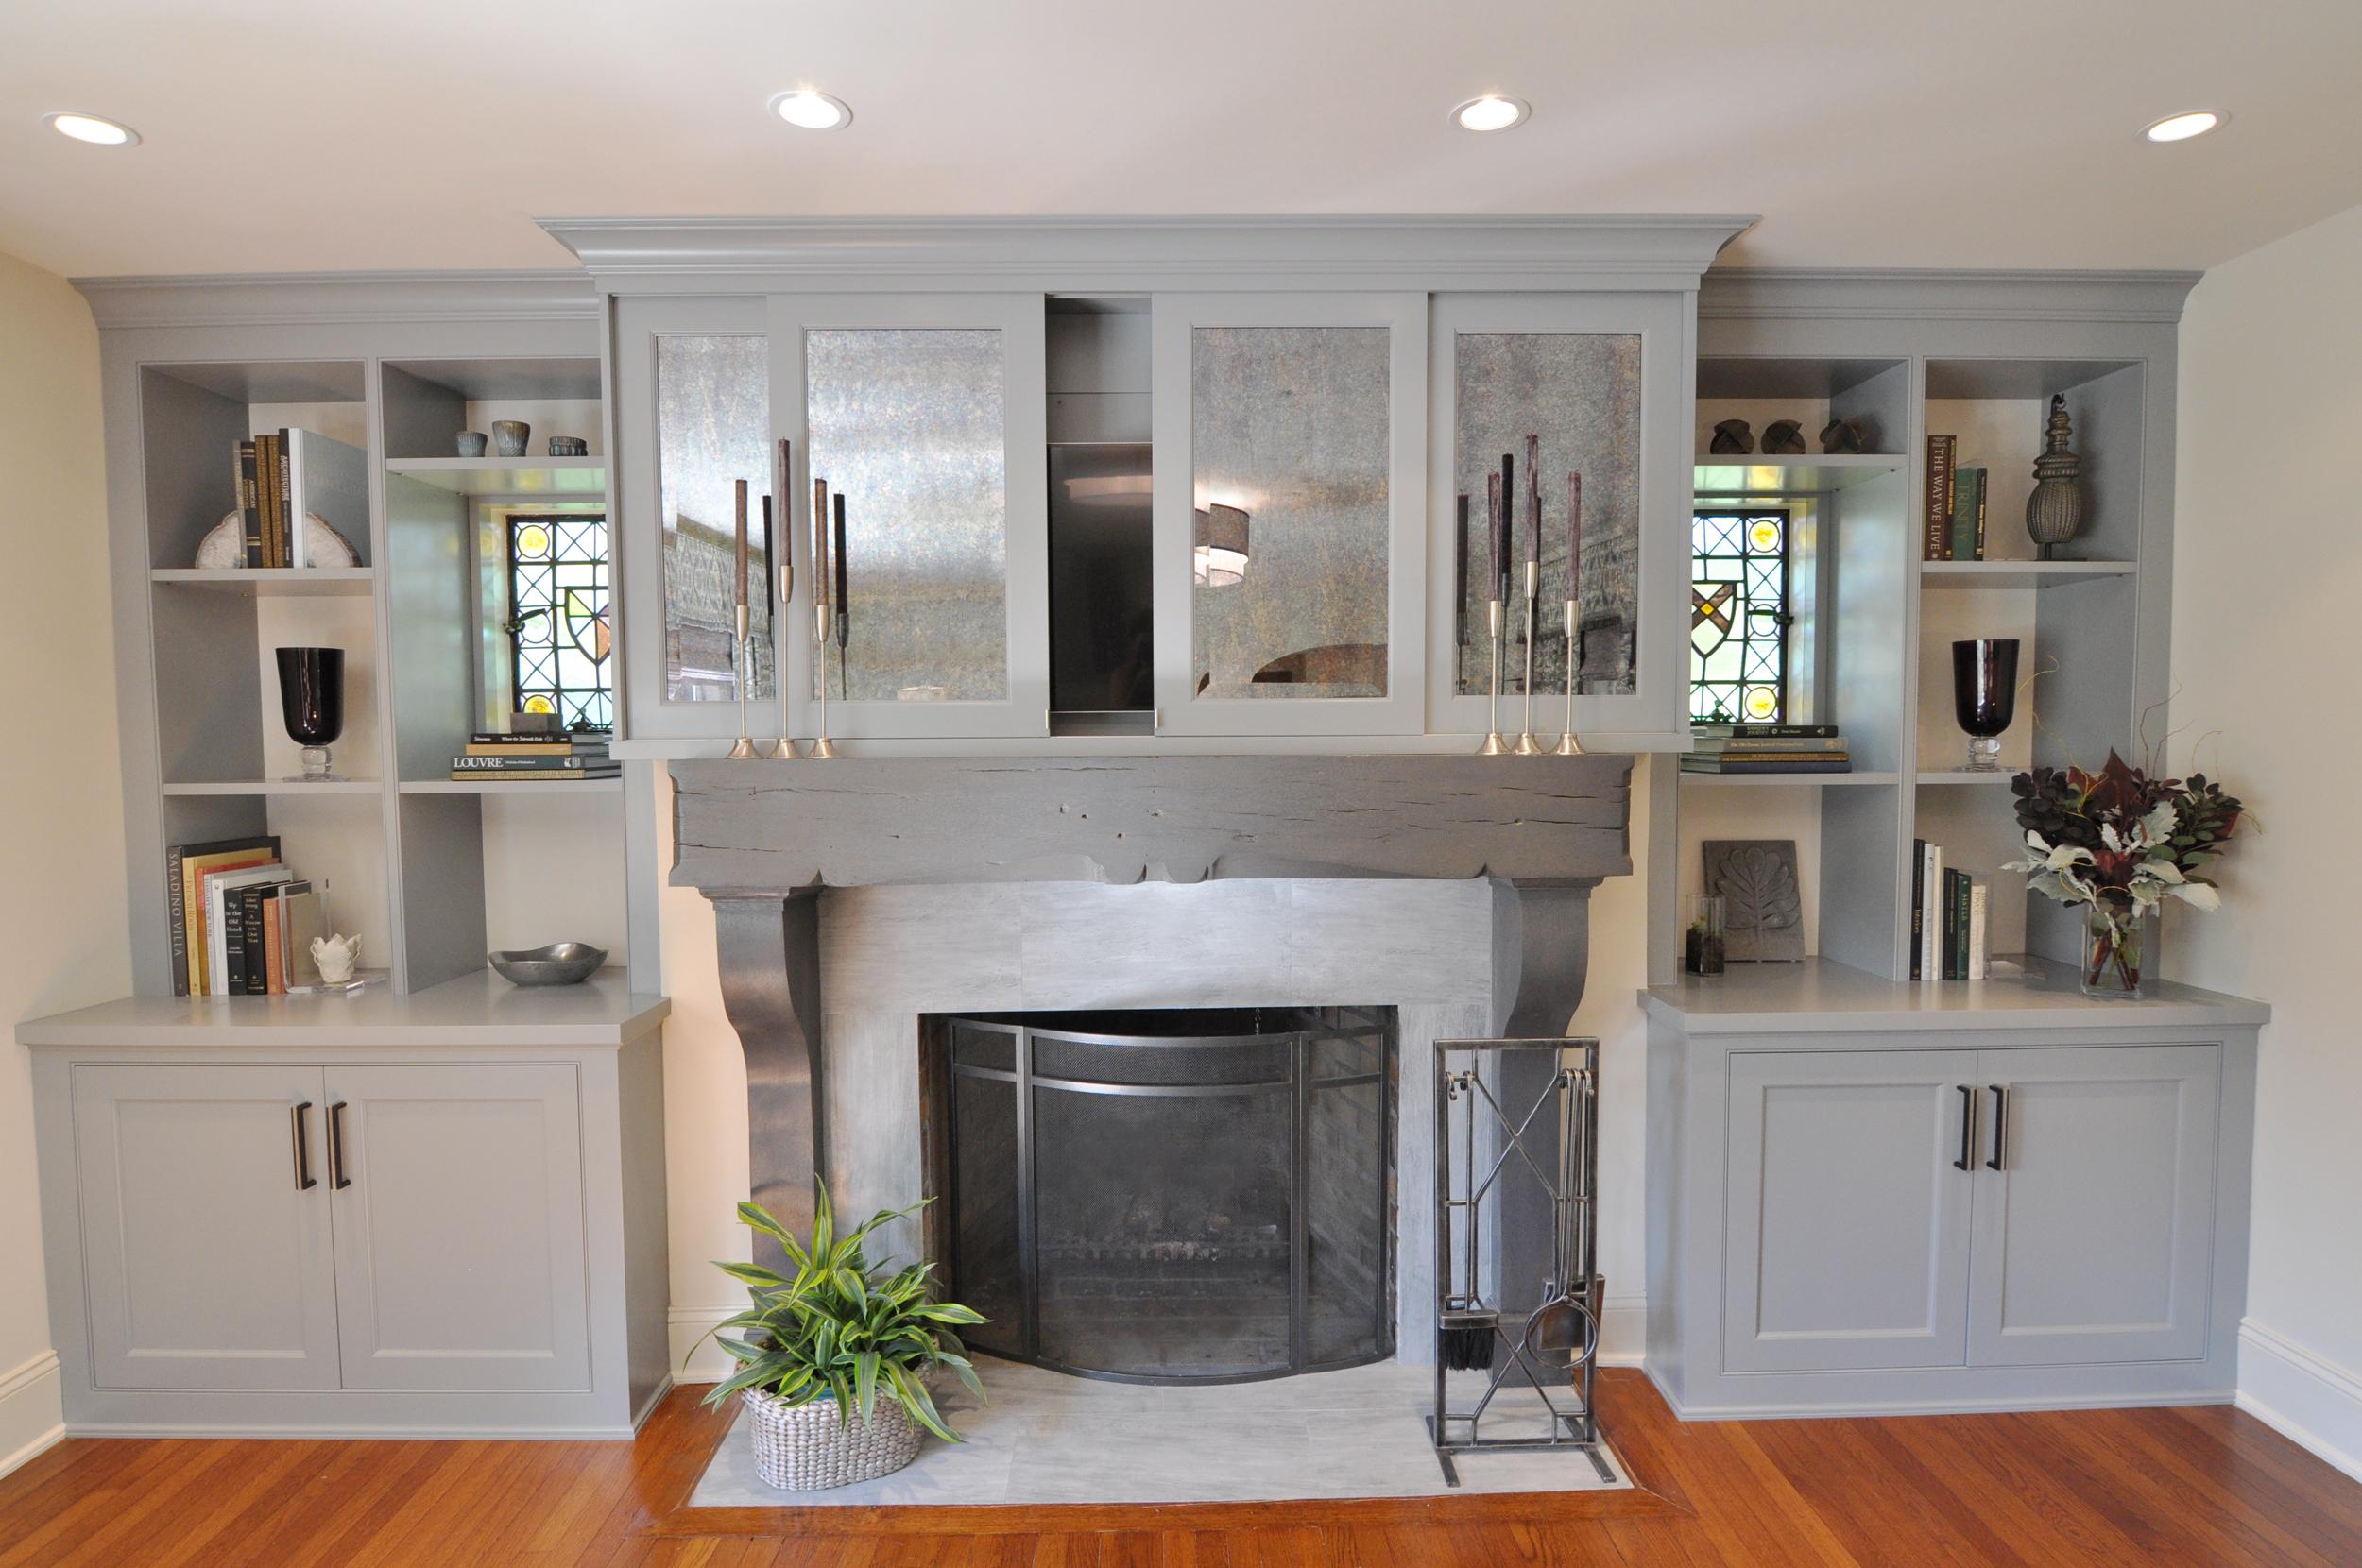 Living Room_Wall Unit_Cabinets_Custom Built-in_Custom Millwork_STEP TWO to Hide TV_Sliding Mirror Panels Hide TV_Fireplace_KAM DESIGN.jpg